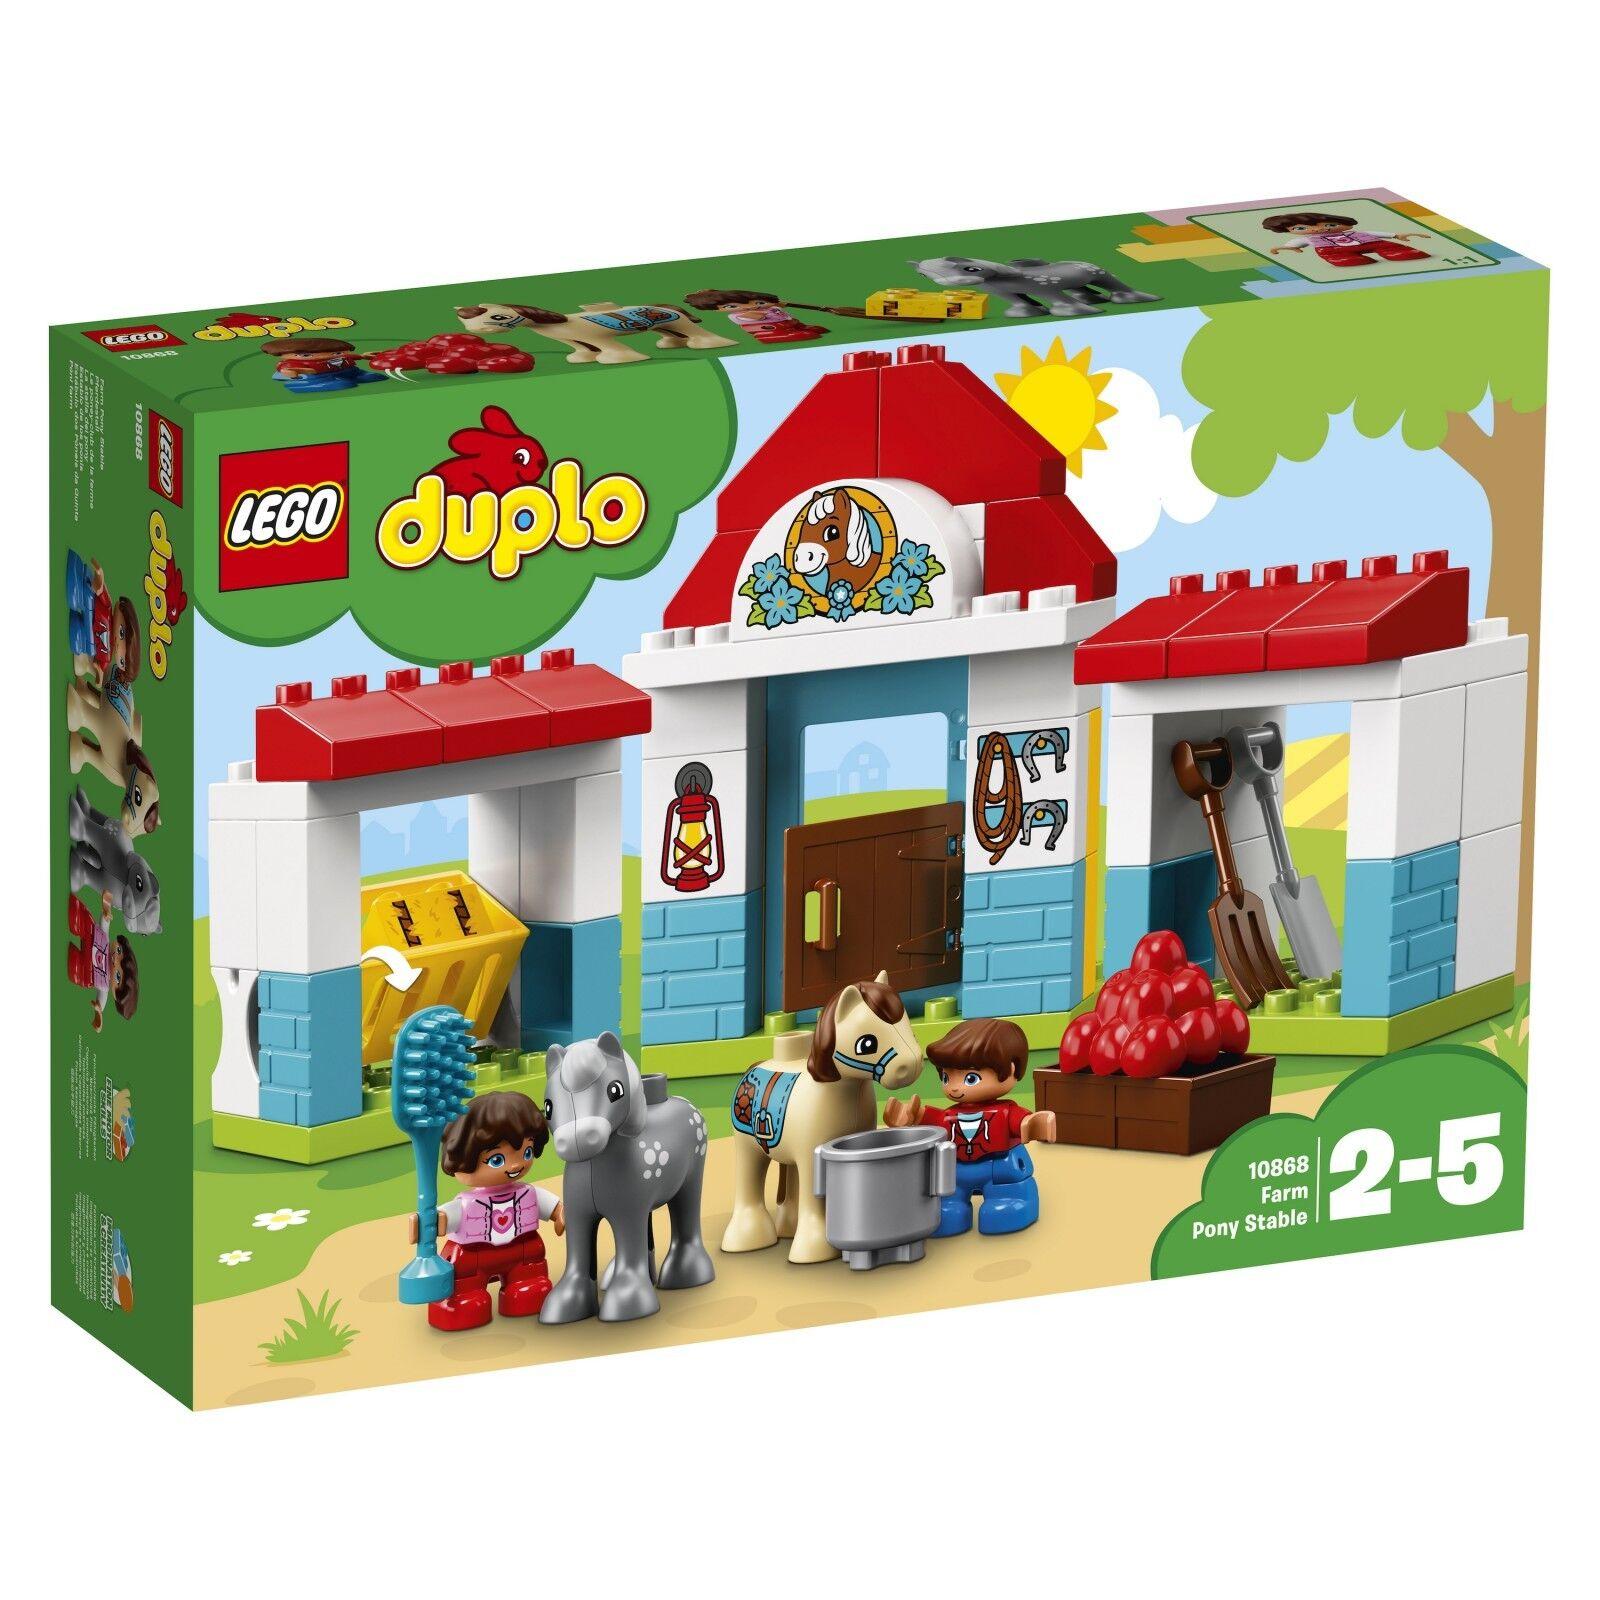 LEGO ® DUPLO ® 10868 SCUDERIA NUOVO OVP _ Farm Pony stable NEW MISB NRFB